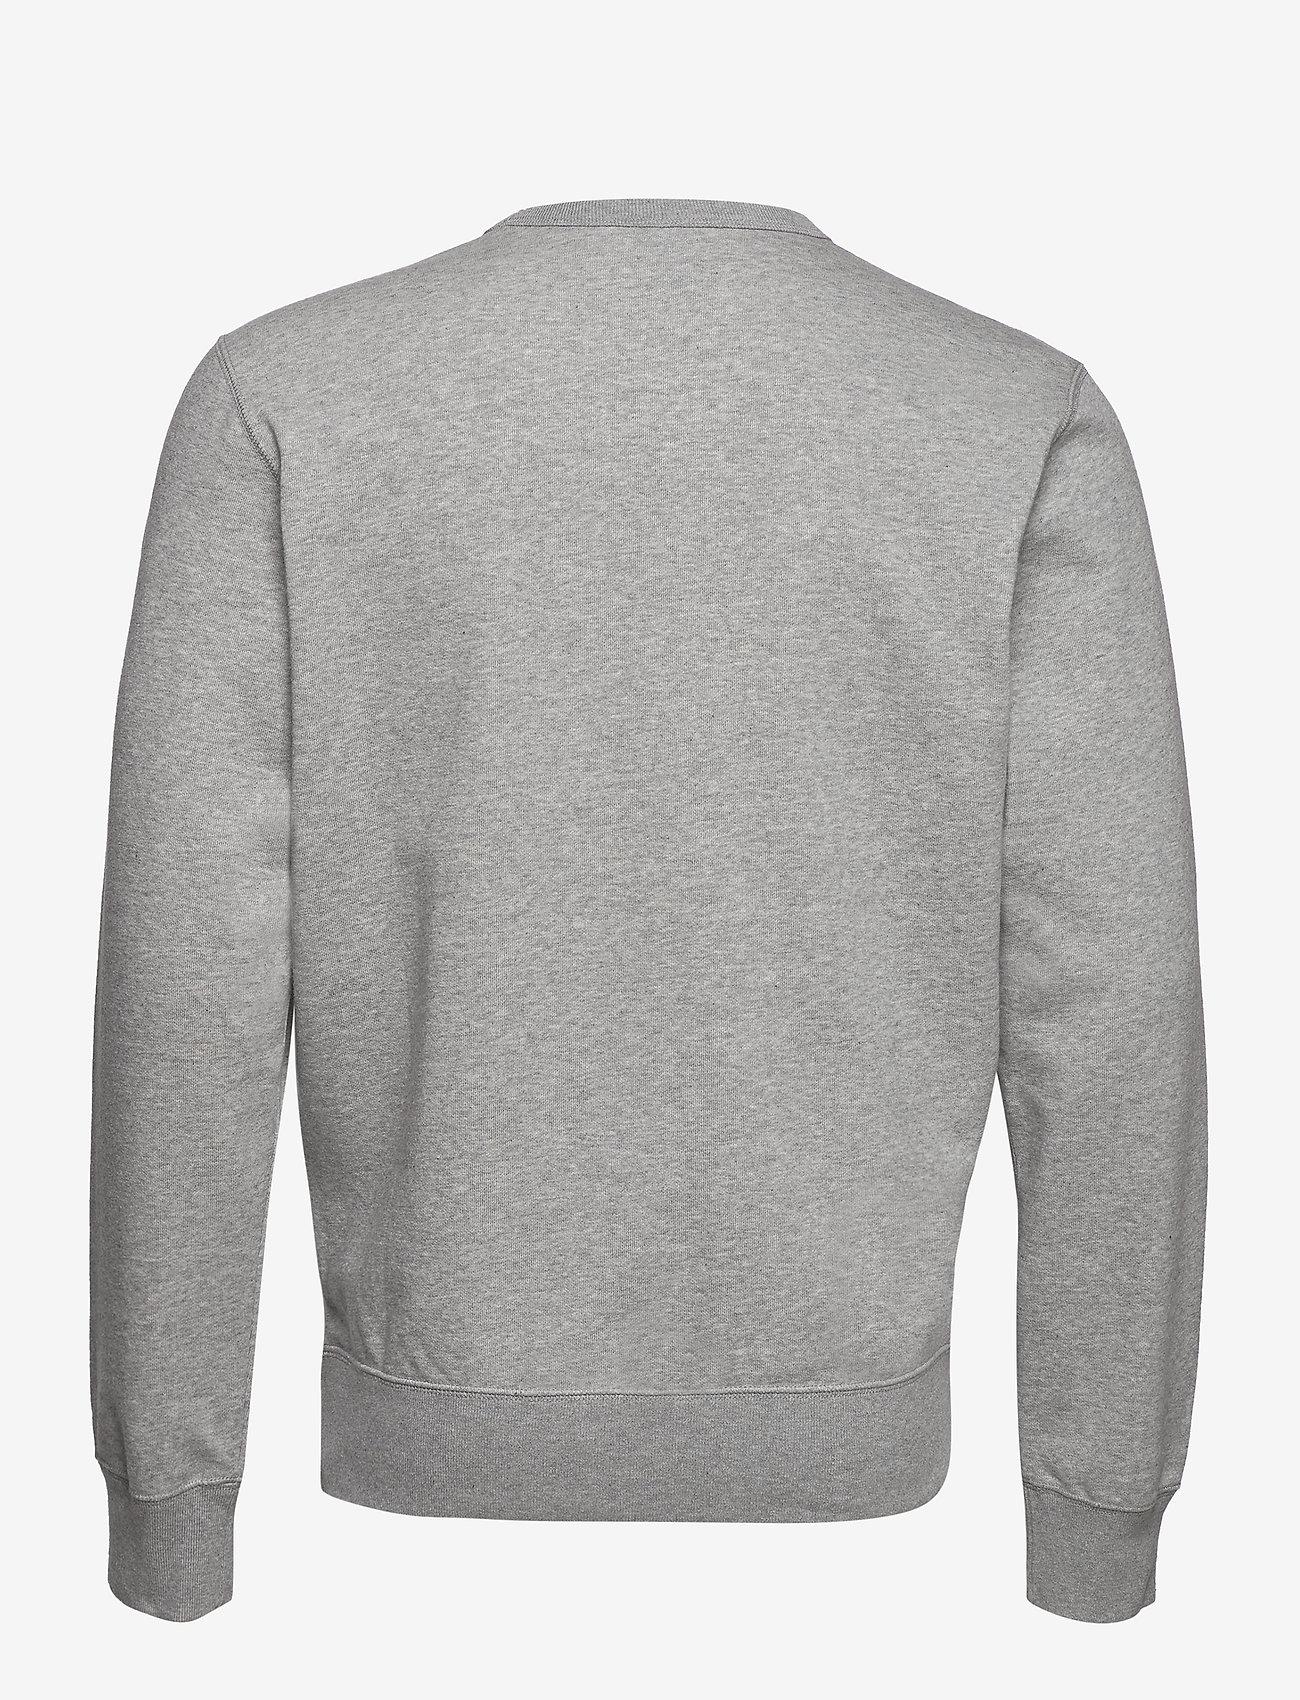 Champion Crewneck Sweatshirt - Sweatshirts OXFORD GREY - Menn Klær